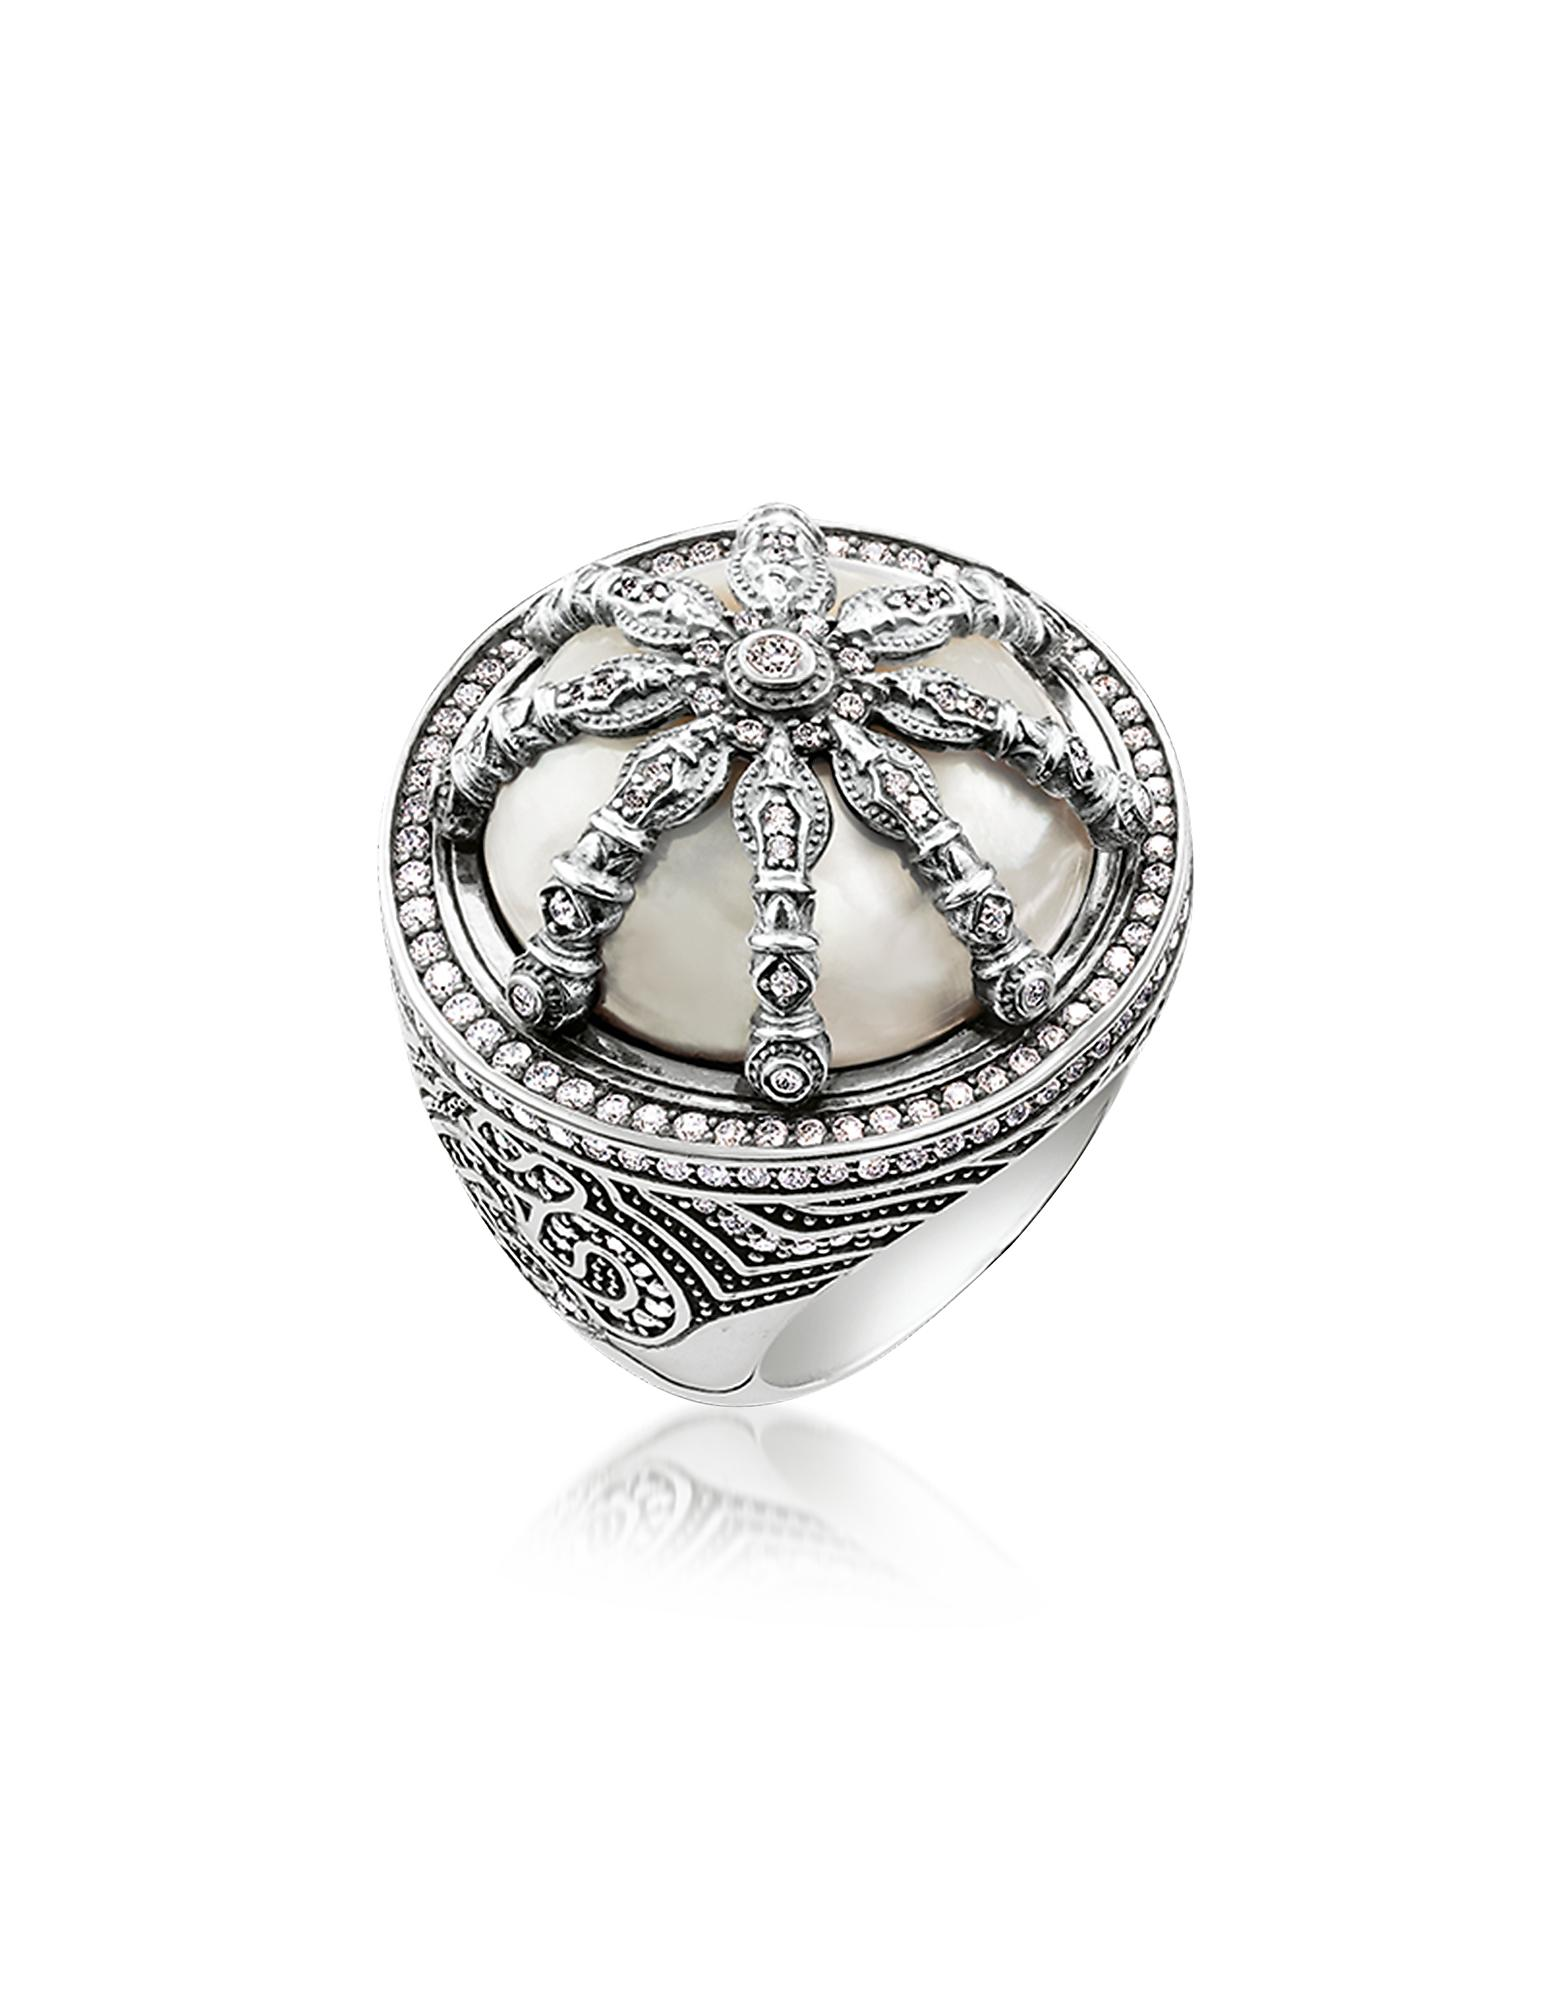 b37b9700f4f0 Thomas Sabo. Women s Metallic Blackened Sterling Silver   Mother Of Pearl  Ring ...